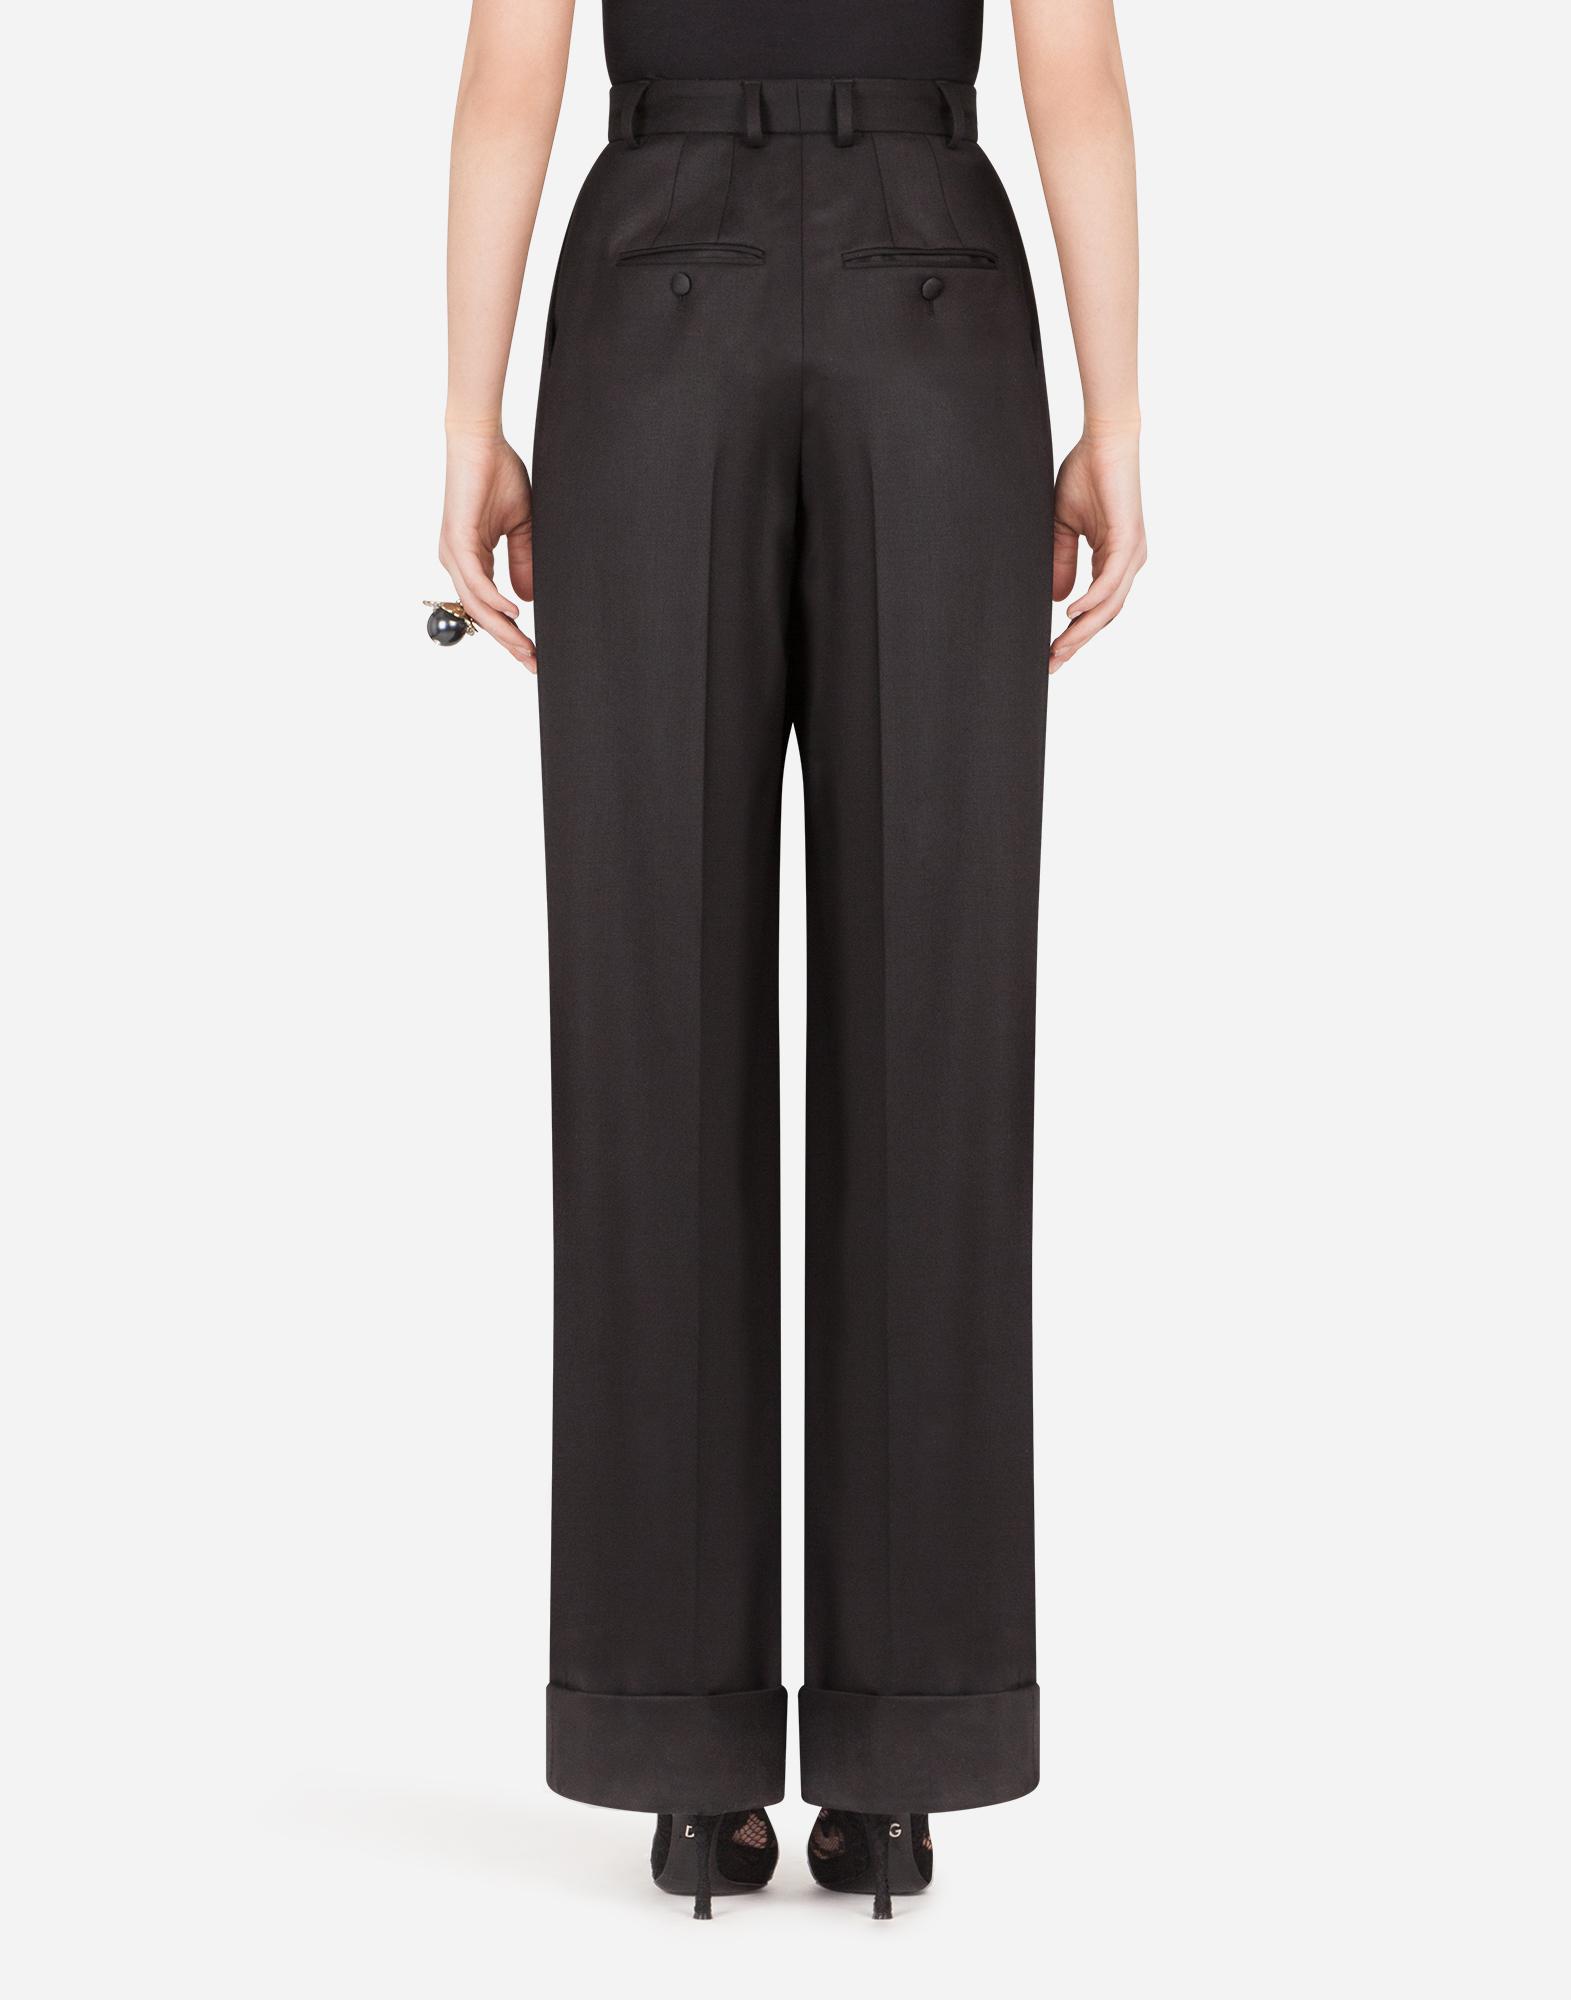 Pantalones Mujer Dolce Gabbana Pantalones Pata De Elefante De Gabardina